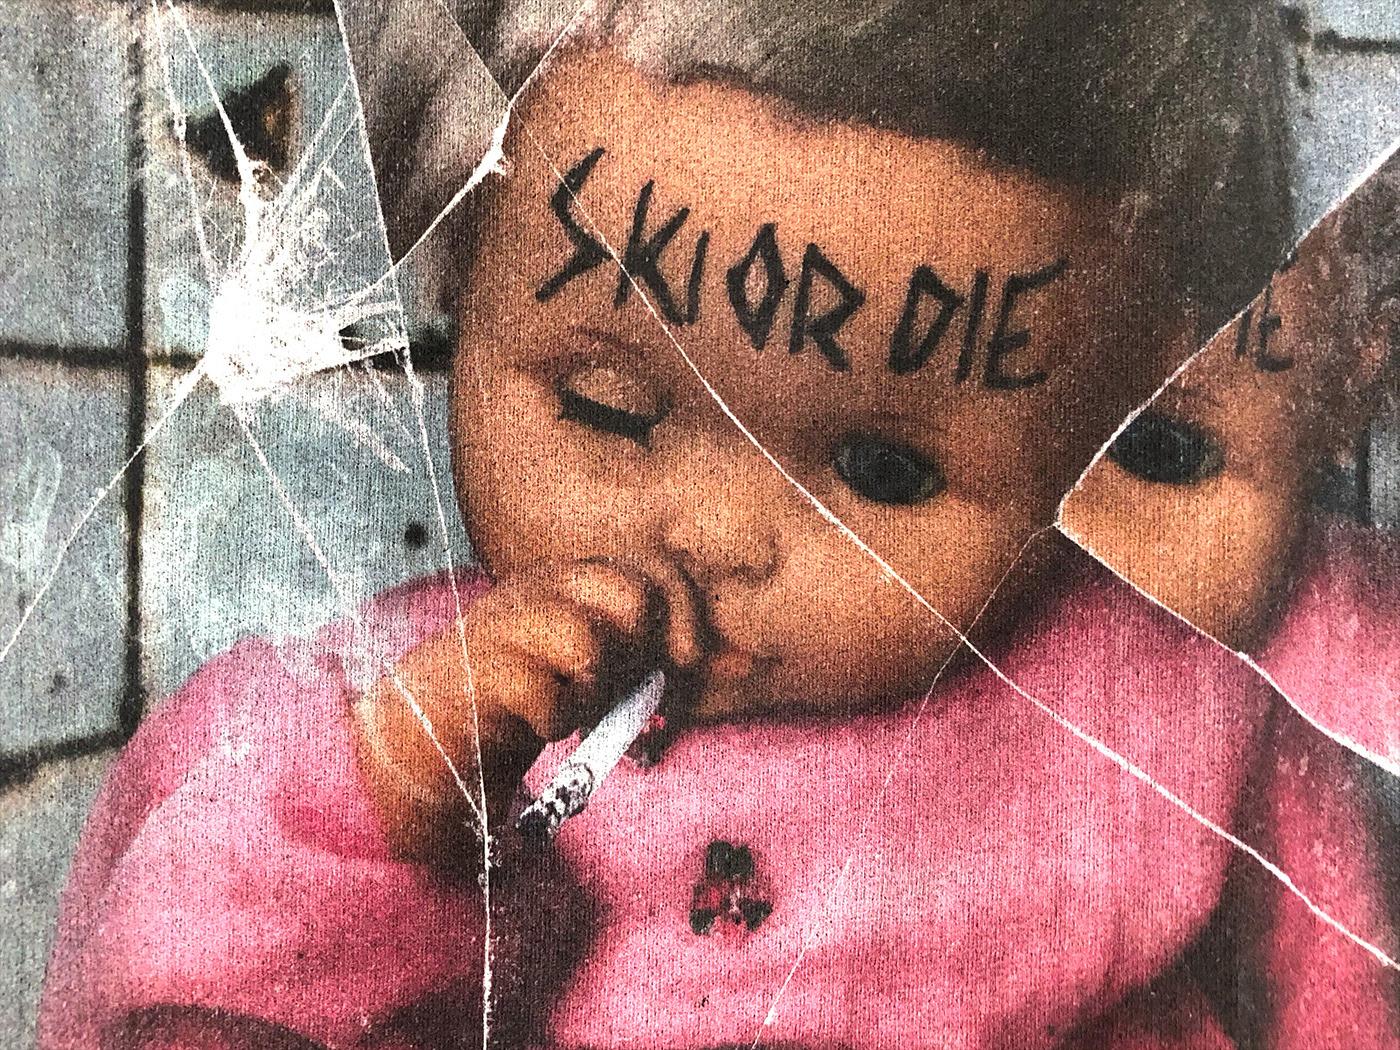 Baby Doll design Distress mirror print shirt smoking t-shirt graphic